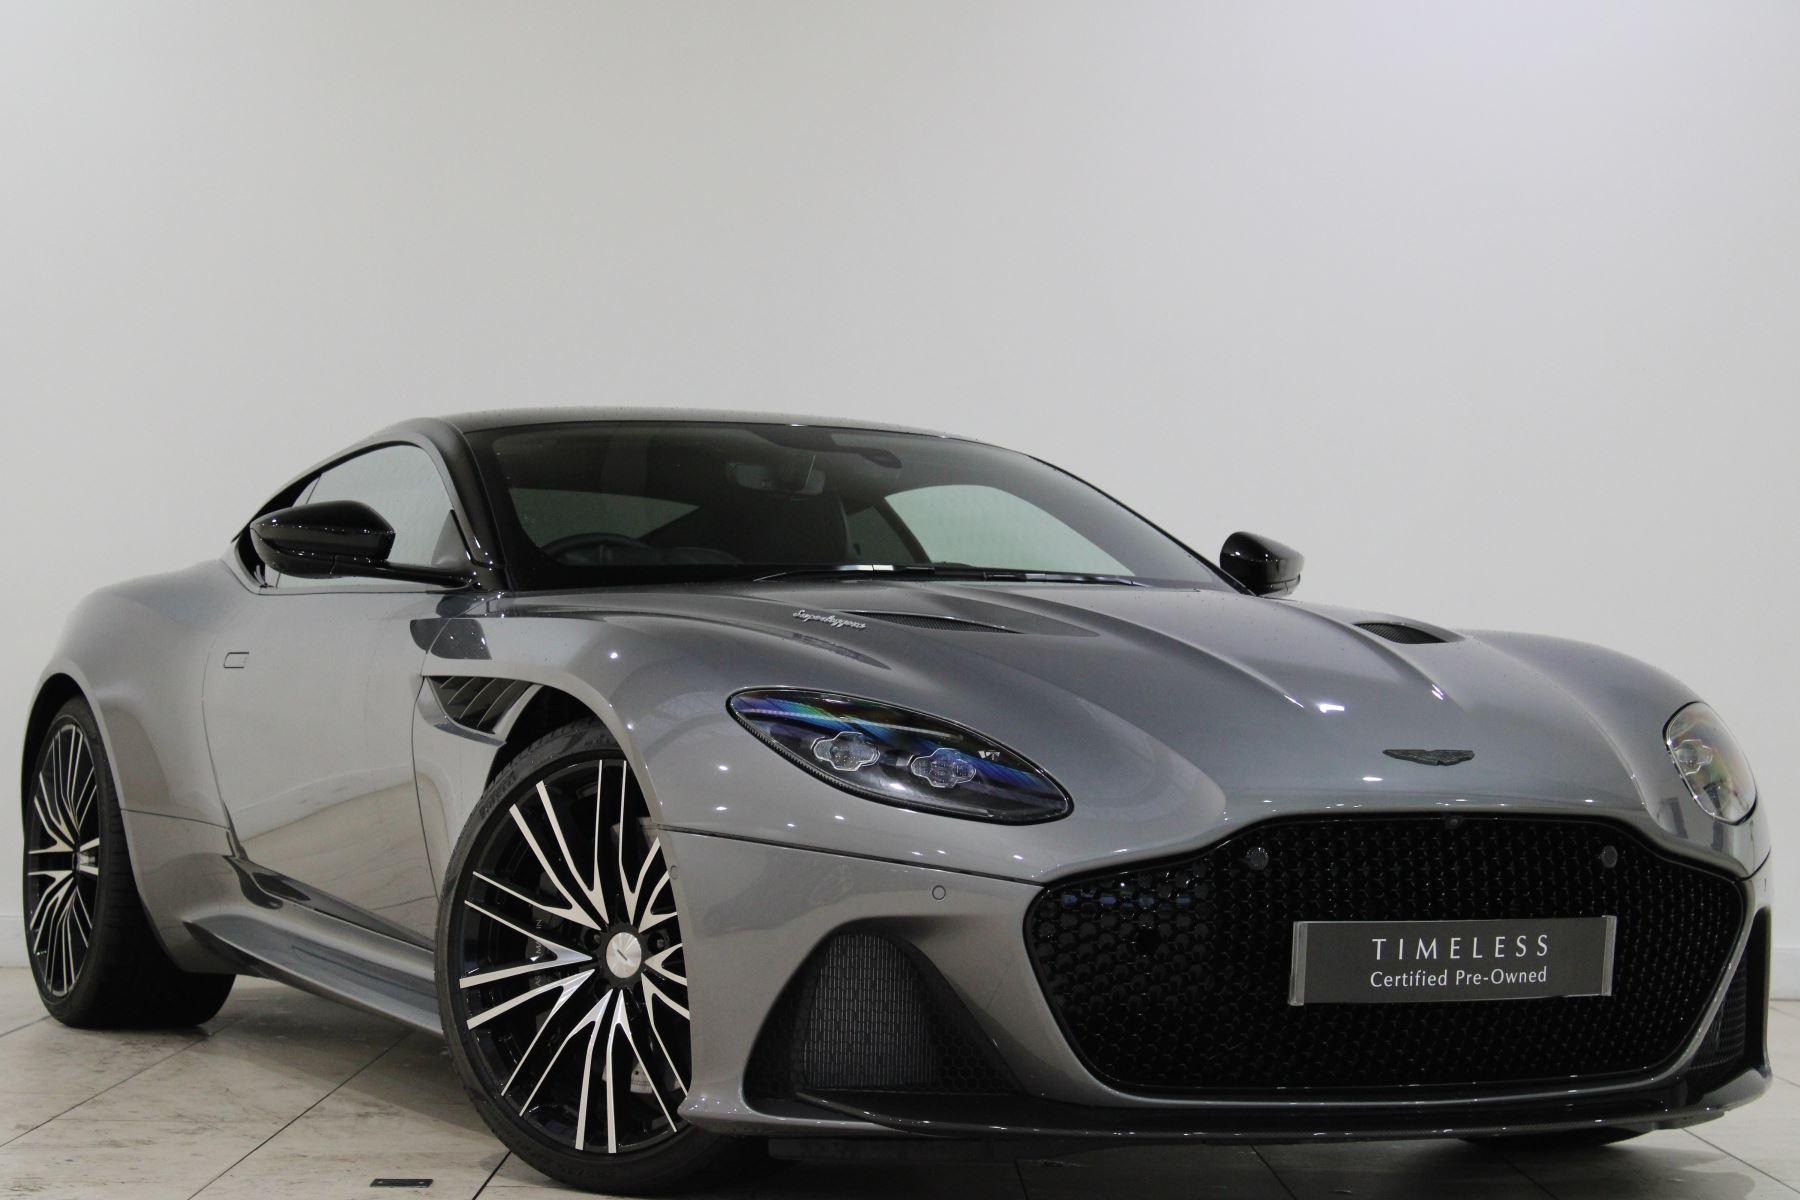 Aston Martin DBS V12 Superleggera 2dr Touchtronic 5.2 Automatic Coupe (2020)